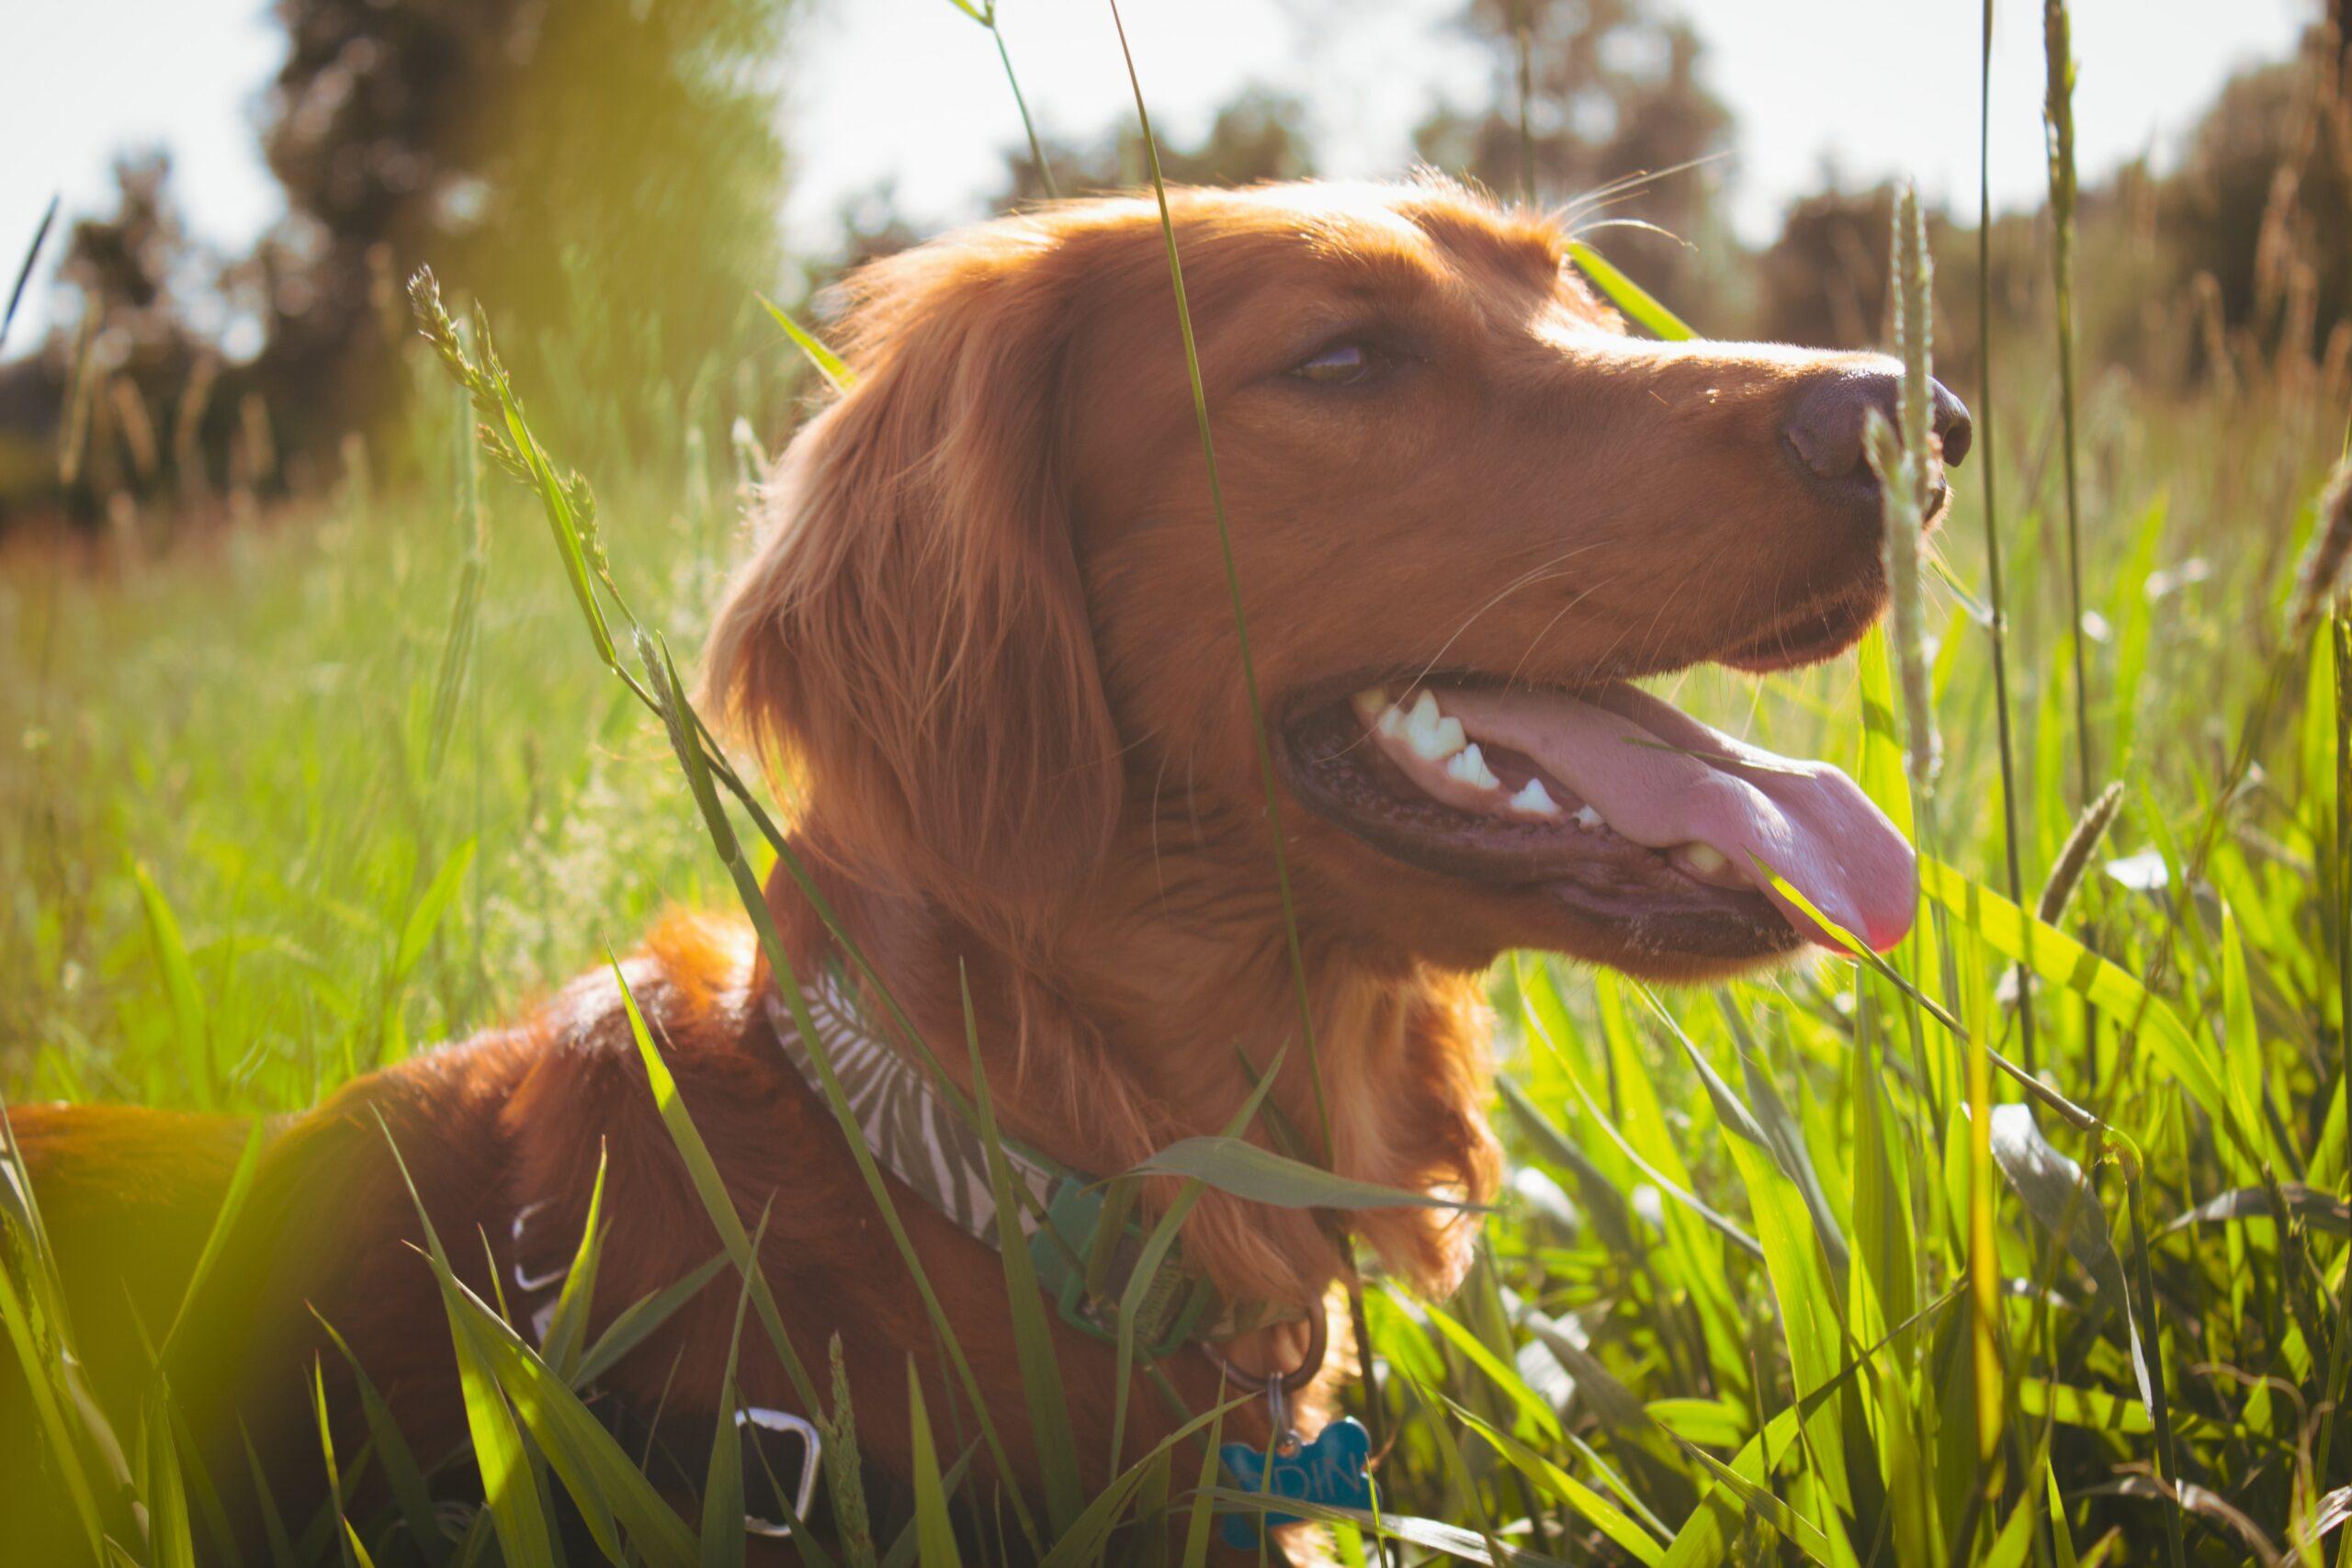 ryan-stone-dog in field-unsplash